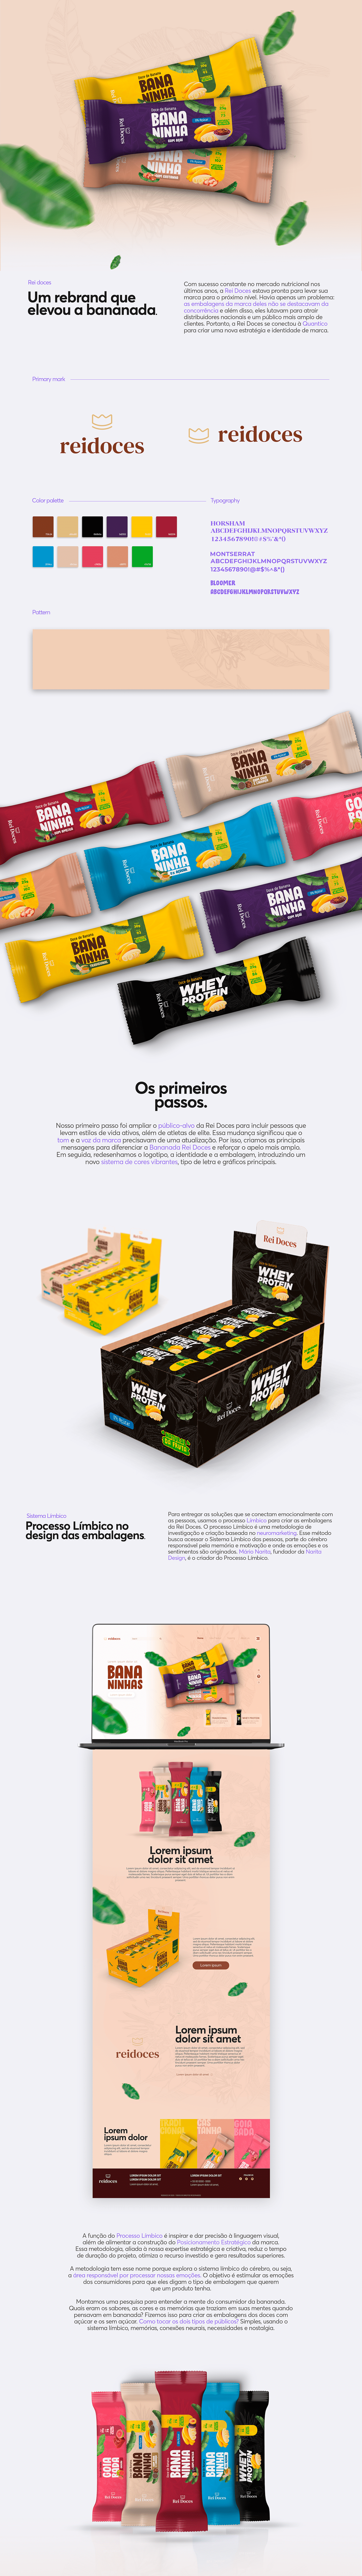 Image may contain: lego and screenshot